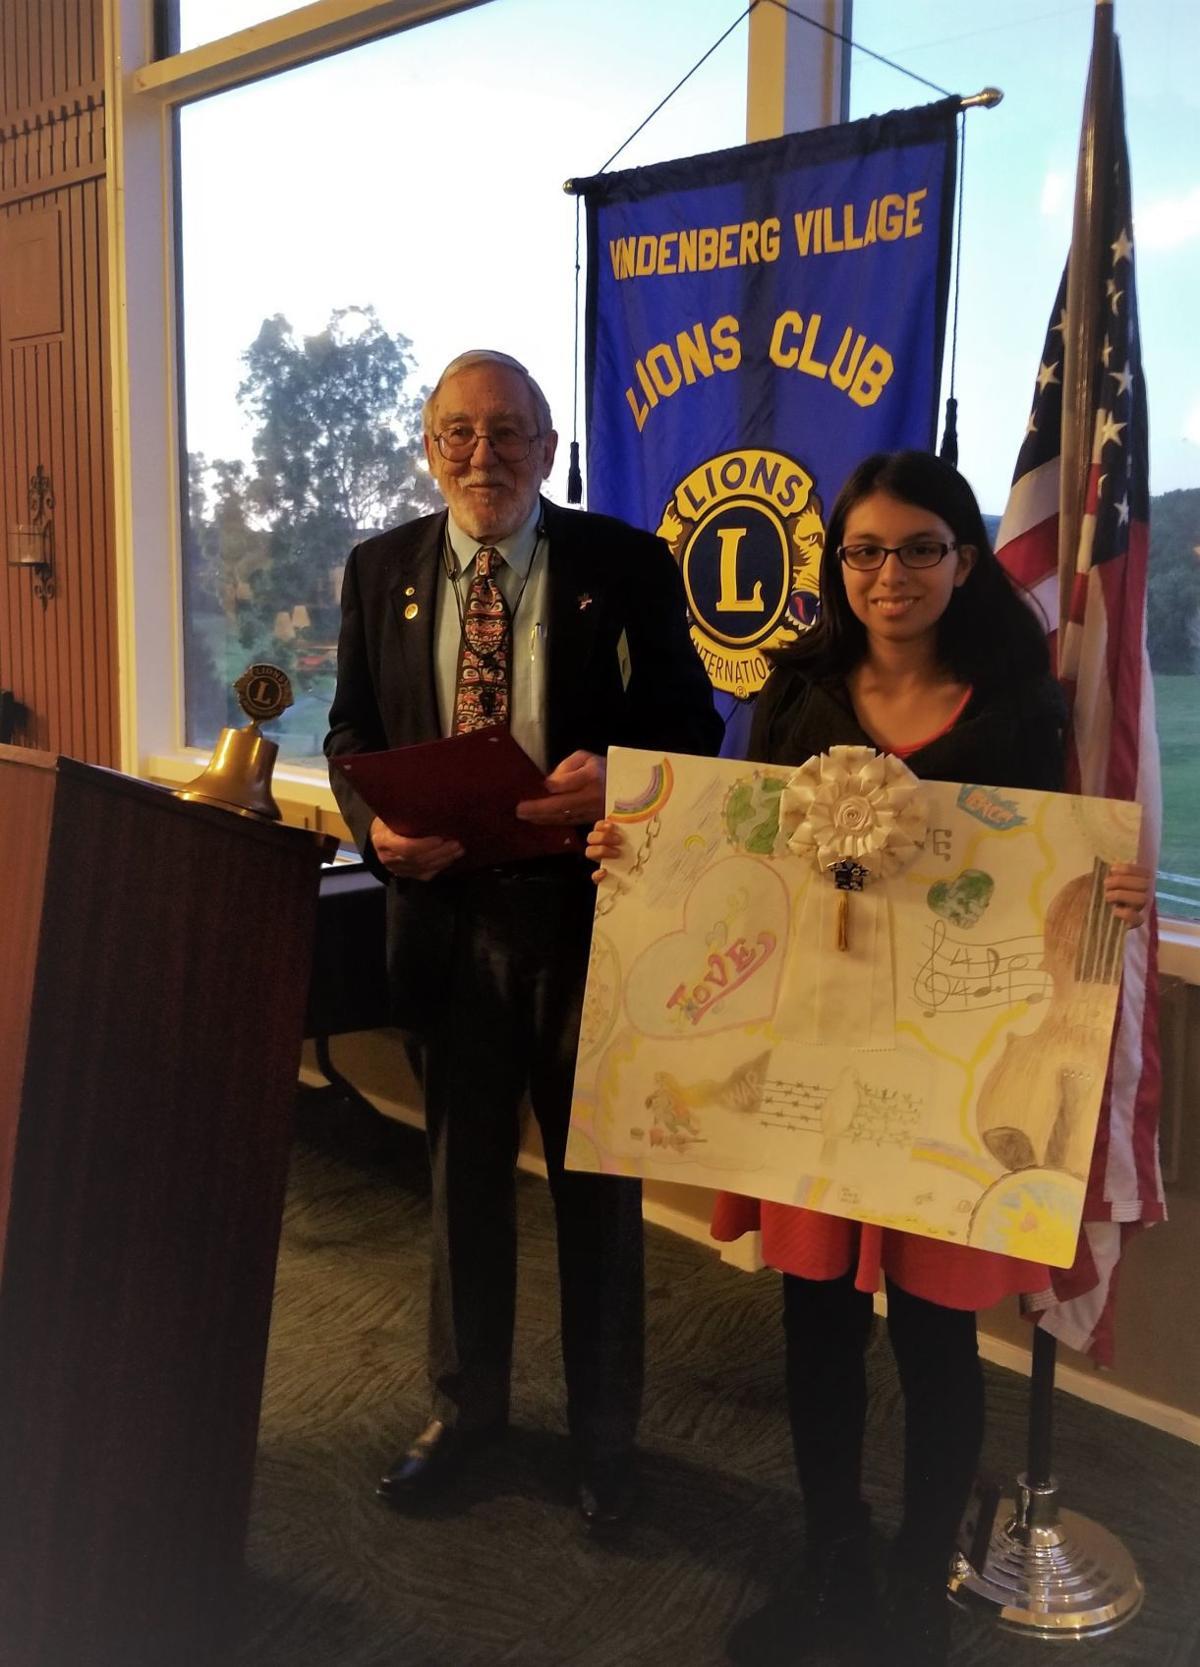 Sethli Montes wins VV Lions Club poster competition